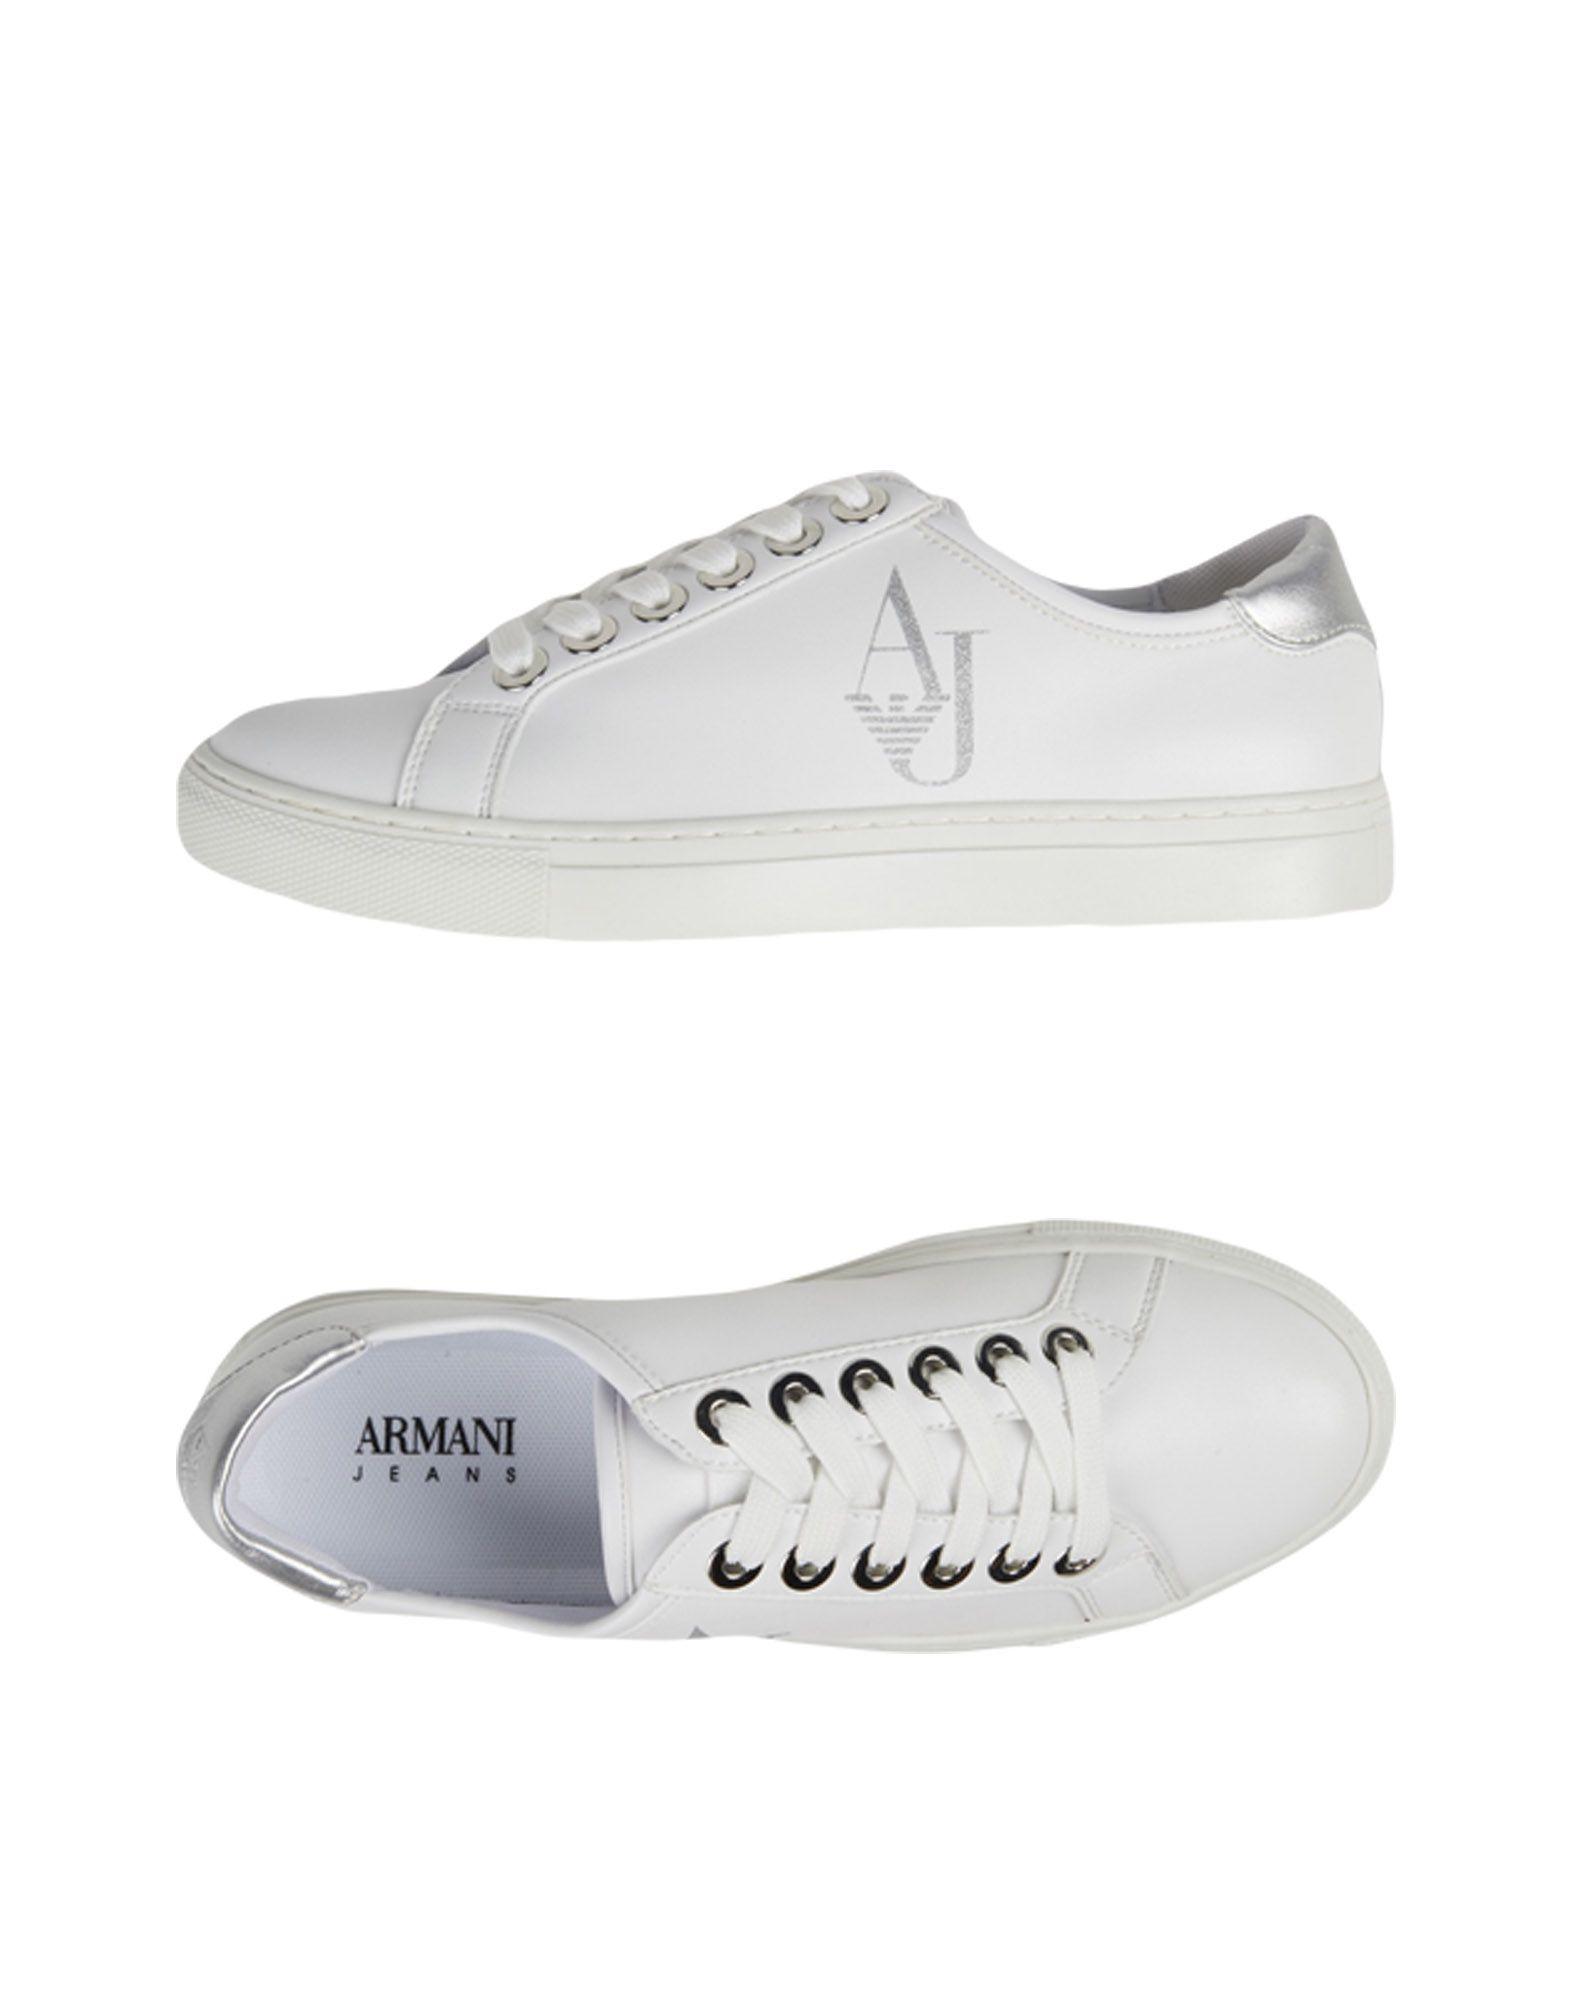 Armani Jeans Sneakers - Women Armani  Jeans Sneakers online on  Armani Canada - 11561676TN 32b4d8